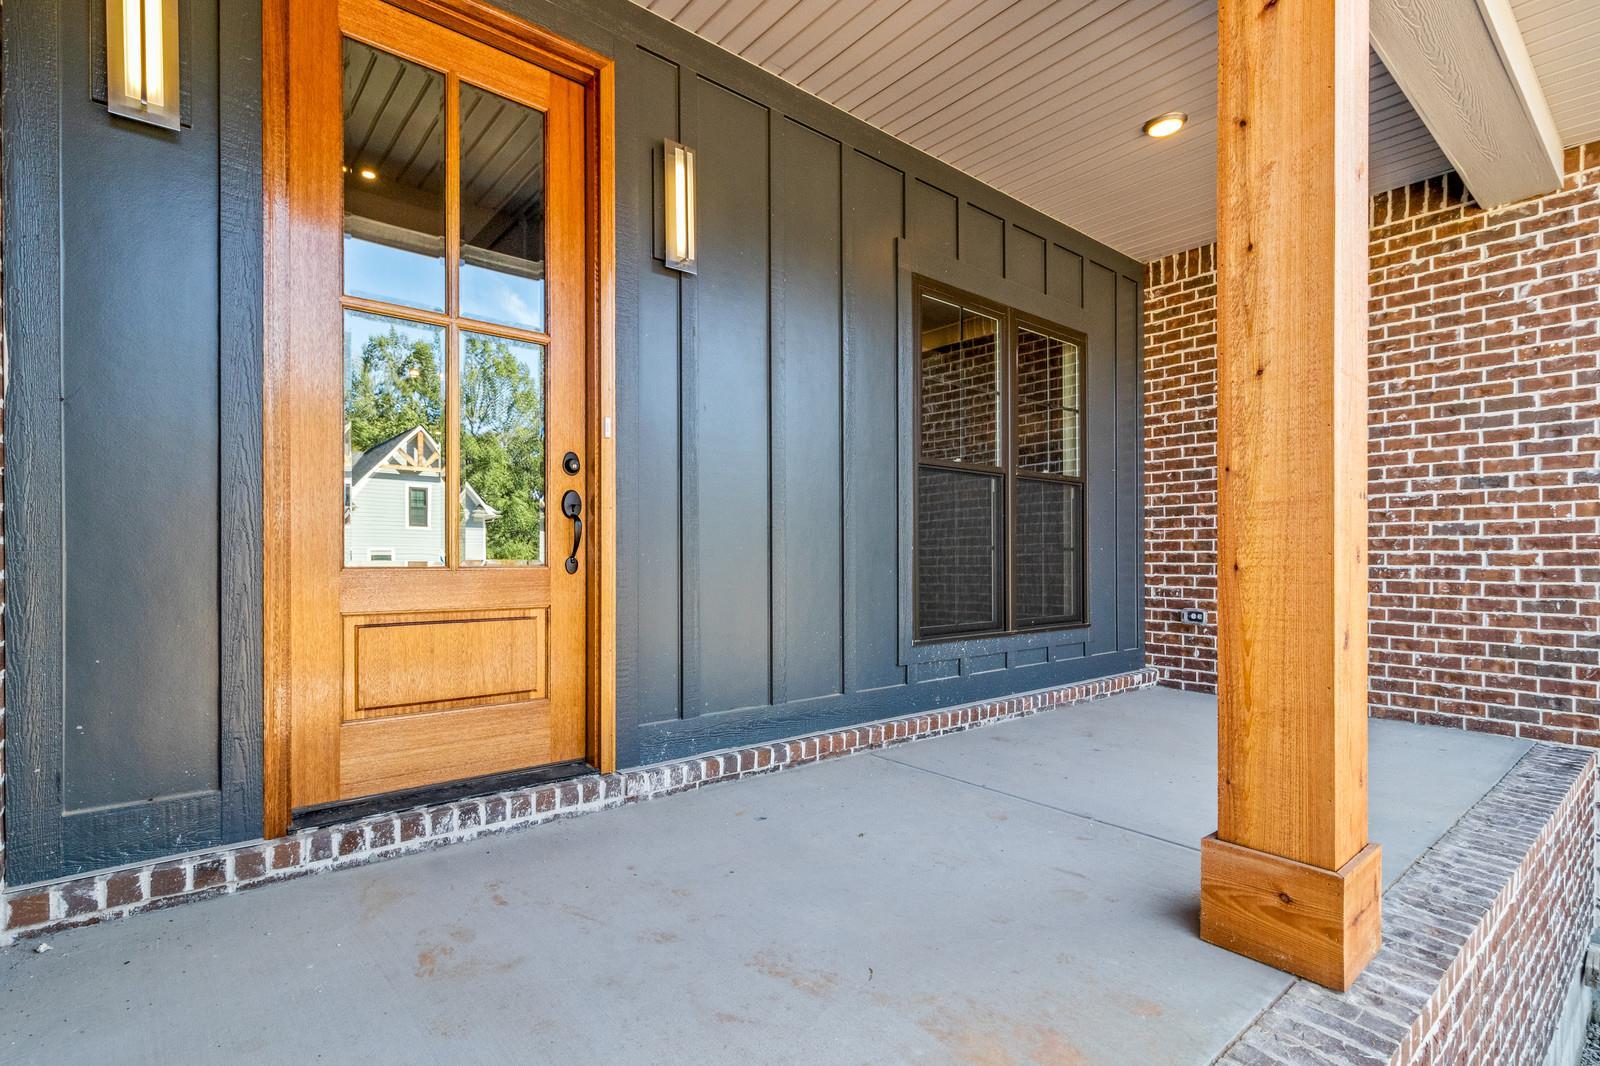 471 Shea's Way , Clarksville, TN 37043 - Clarksville, TN real estate listing